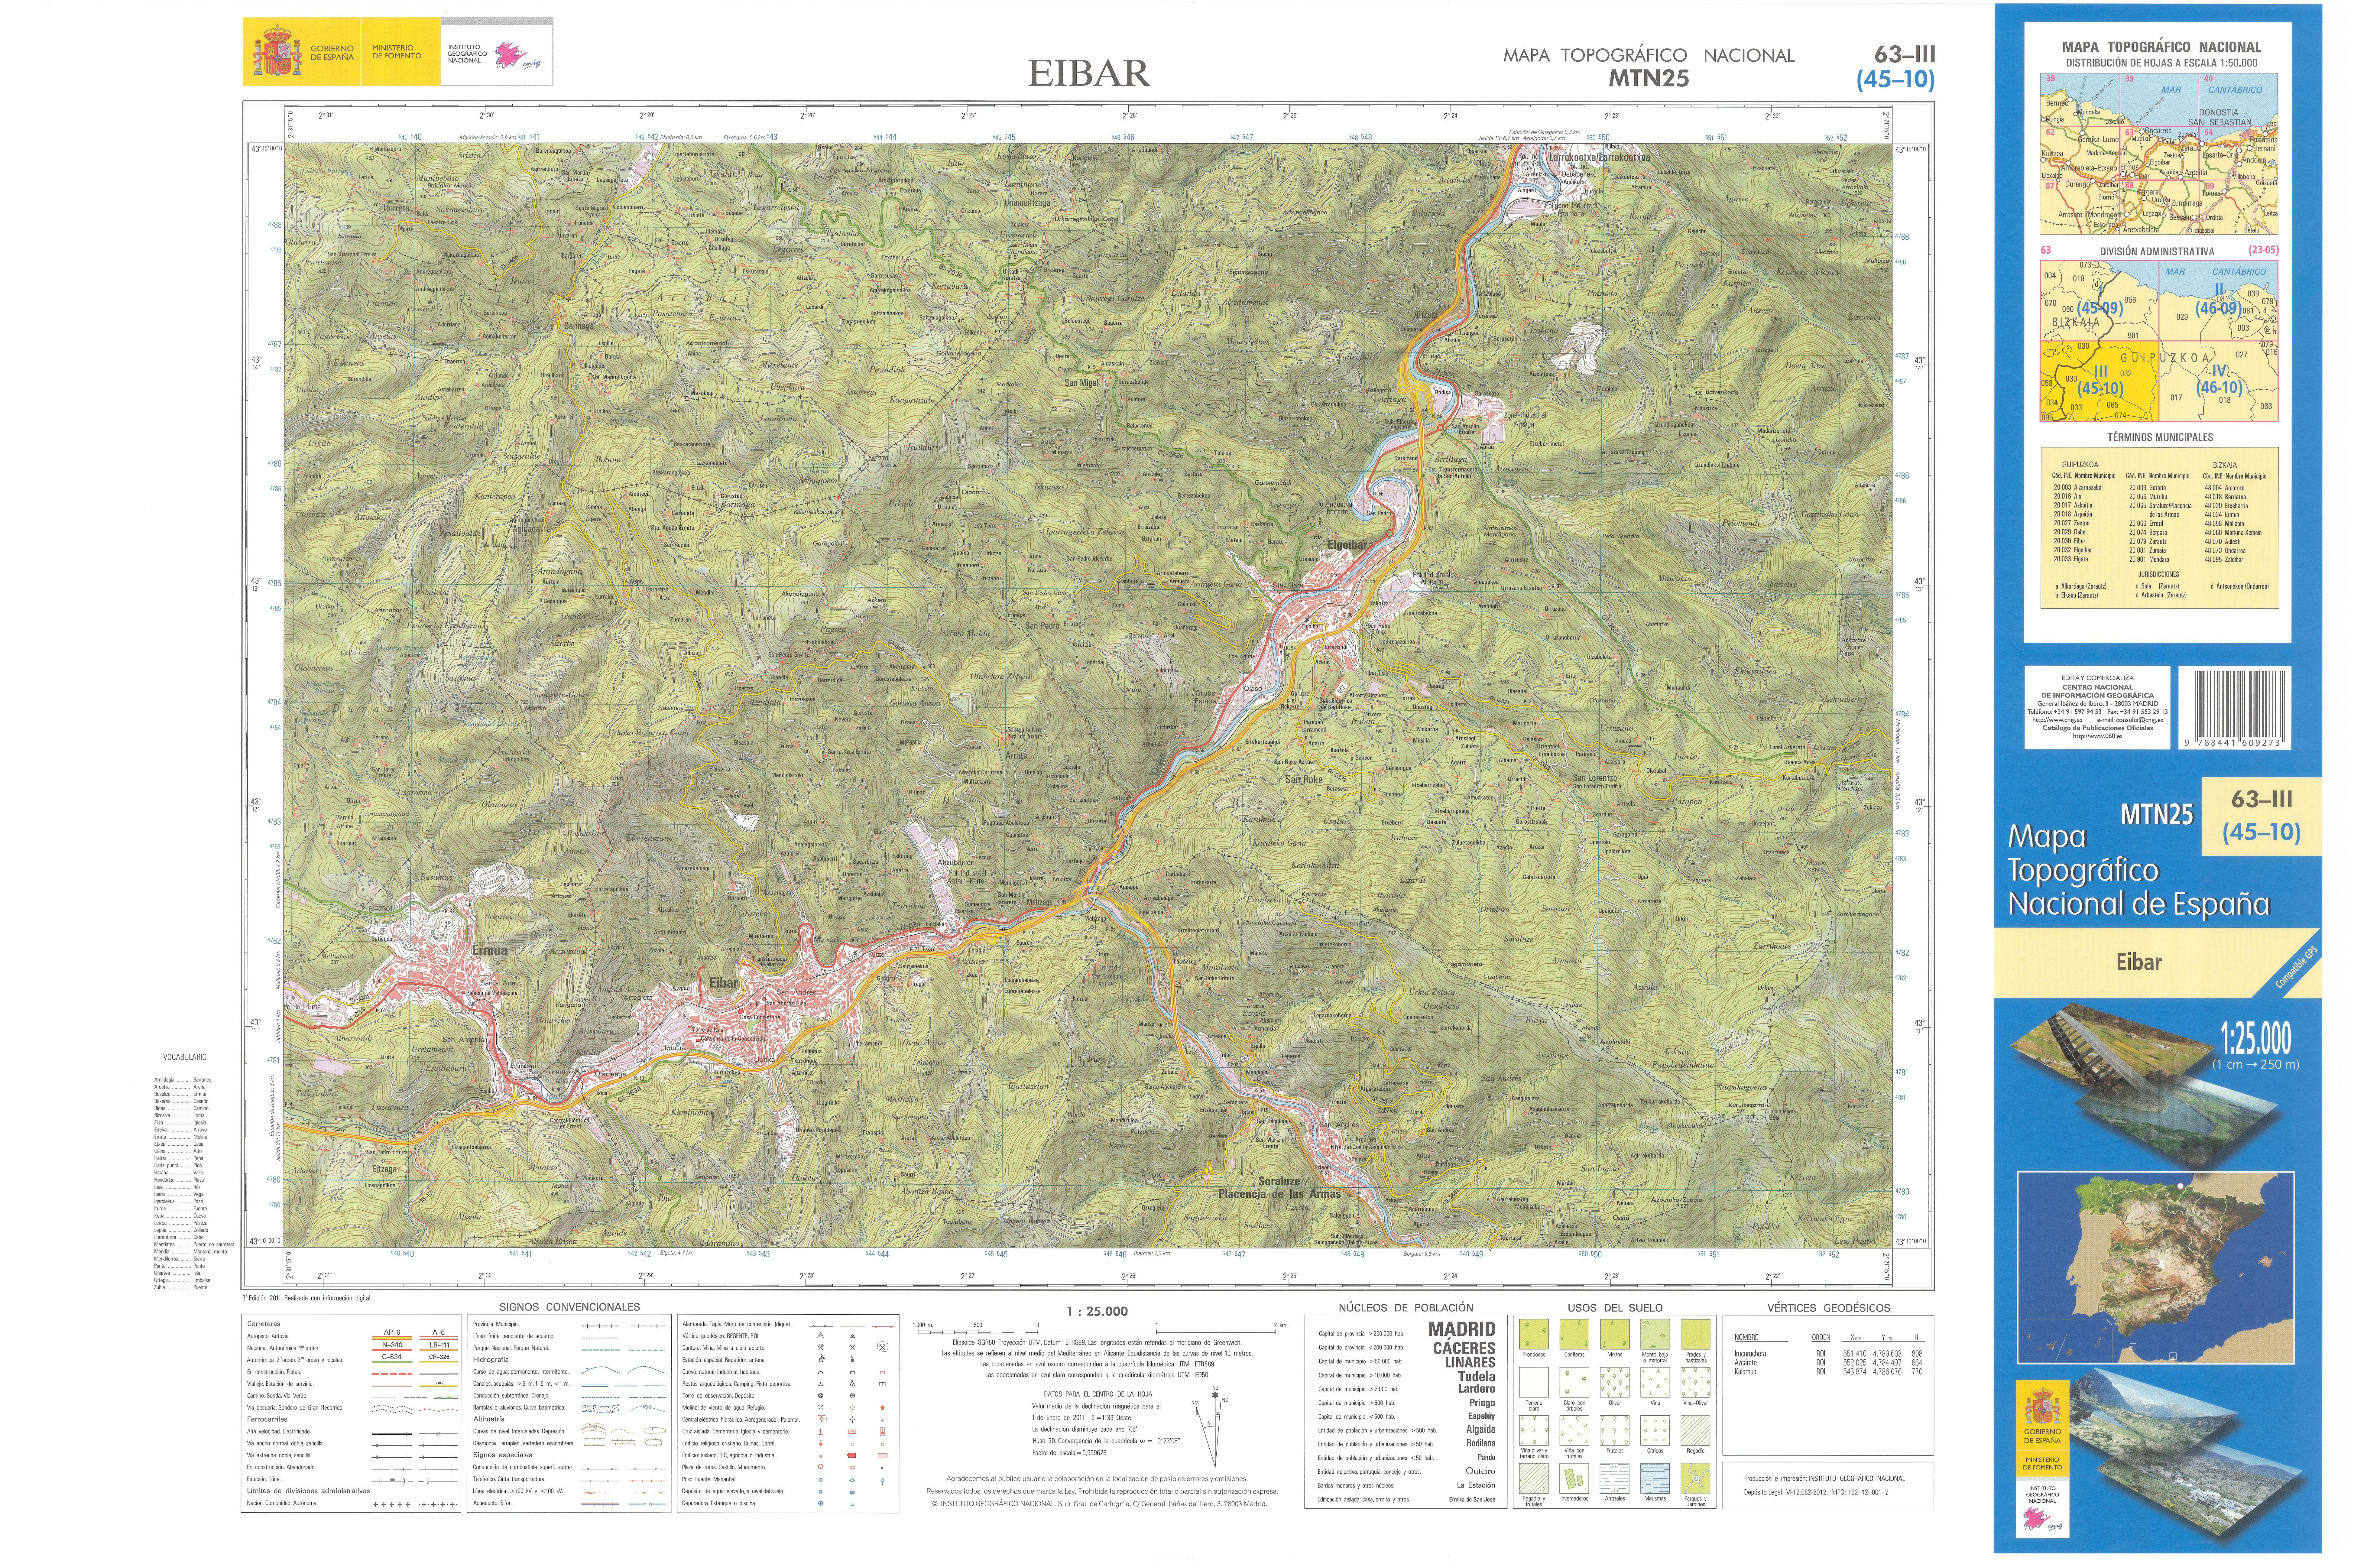 Map Of Spain Eibar.File Mtn25 0063c3 2011 Eibar Jpg Wikimedia Commons